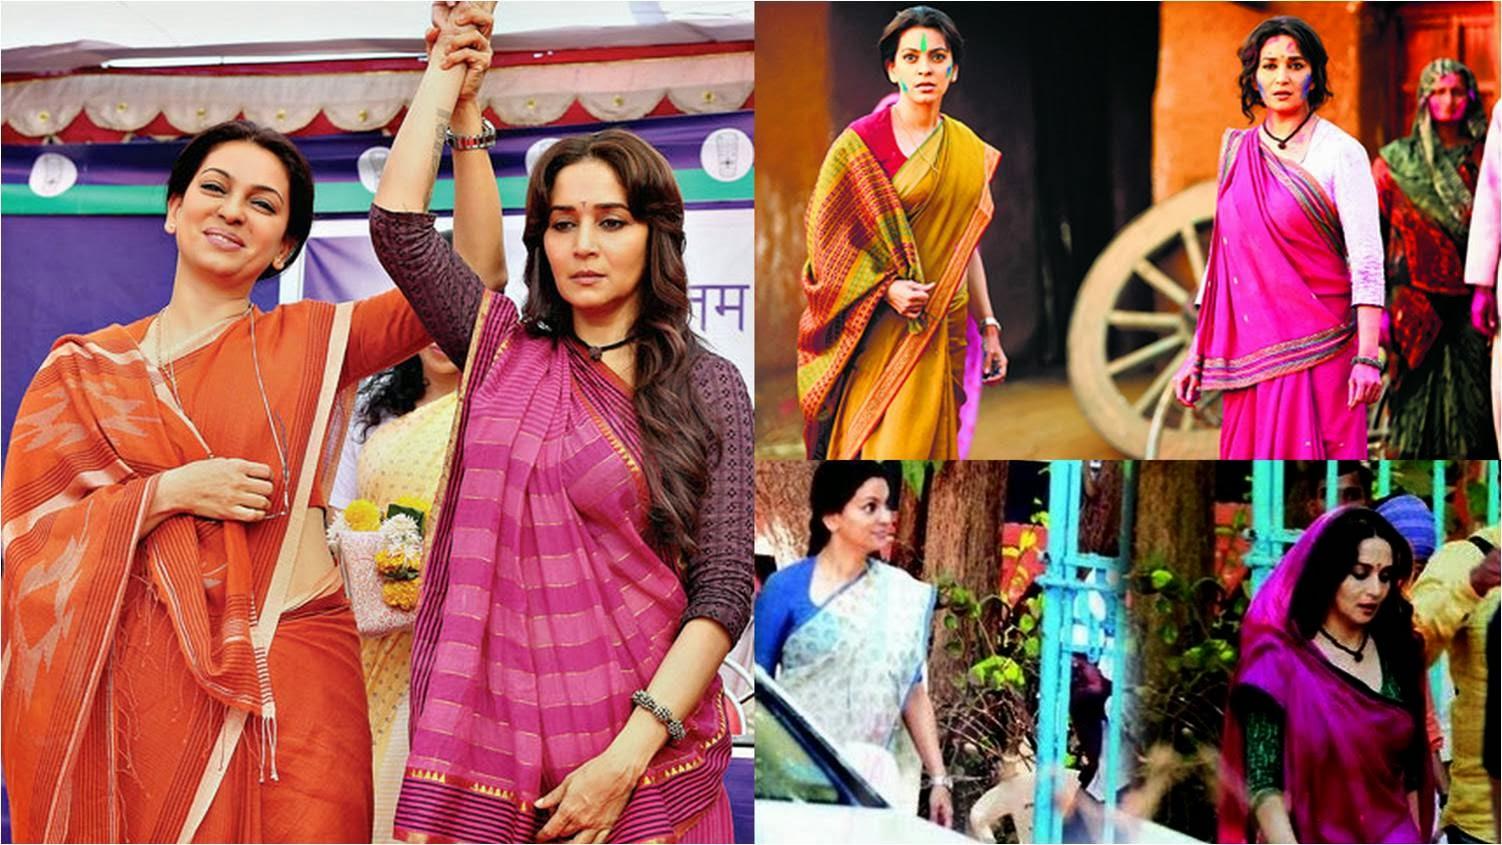 Juhi Chawla and Madhuri Dixit in Gulaab Gang movie stills